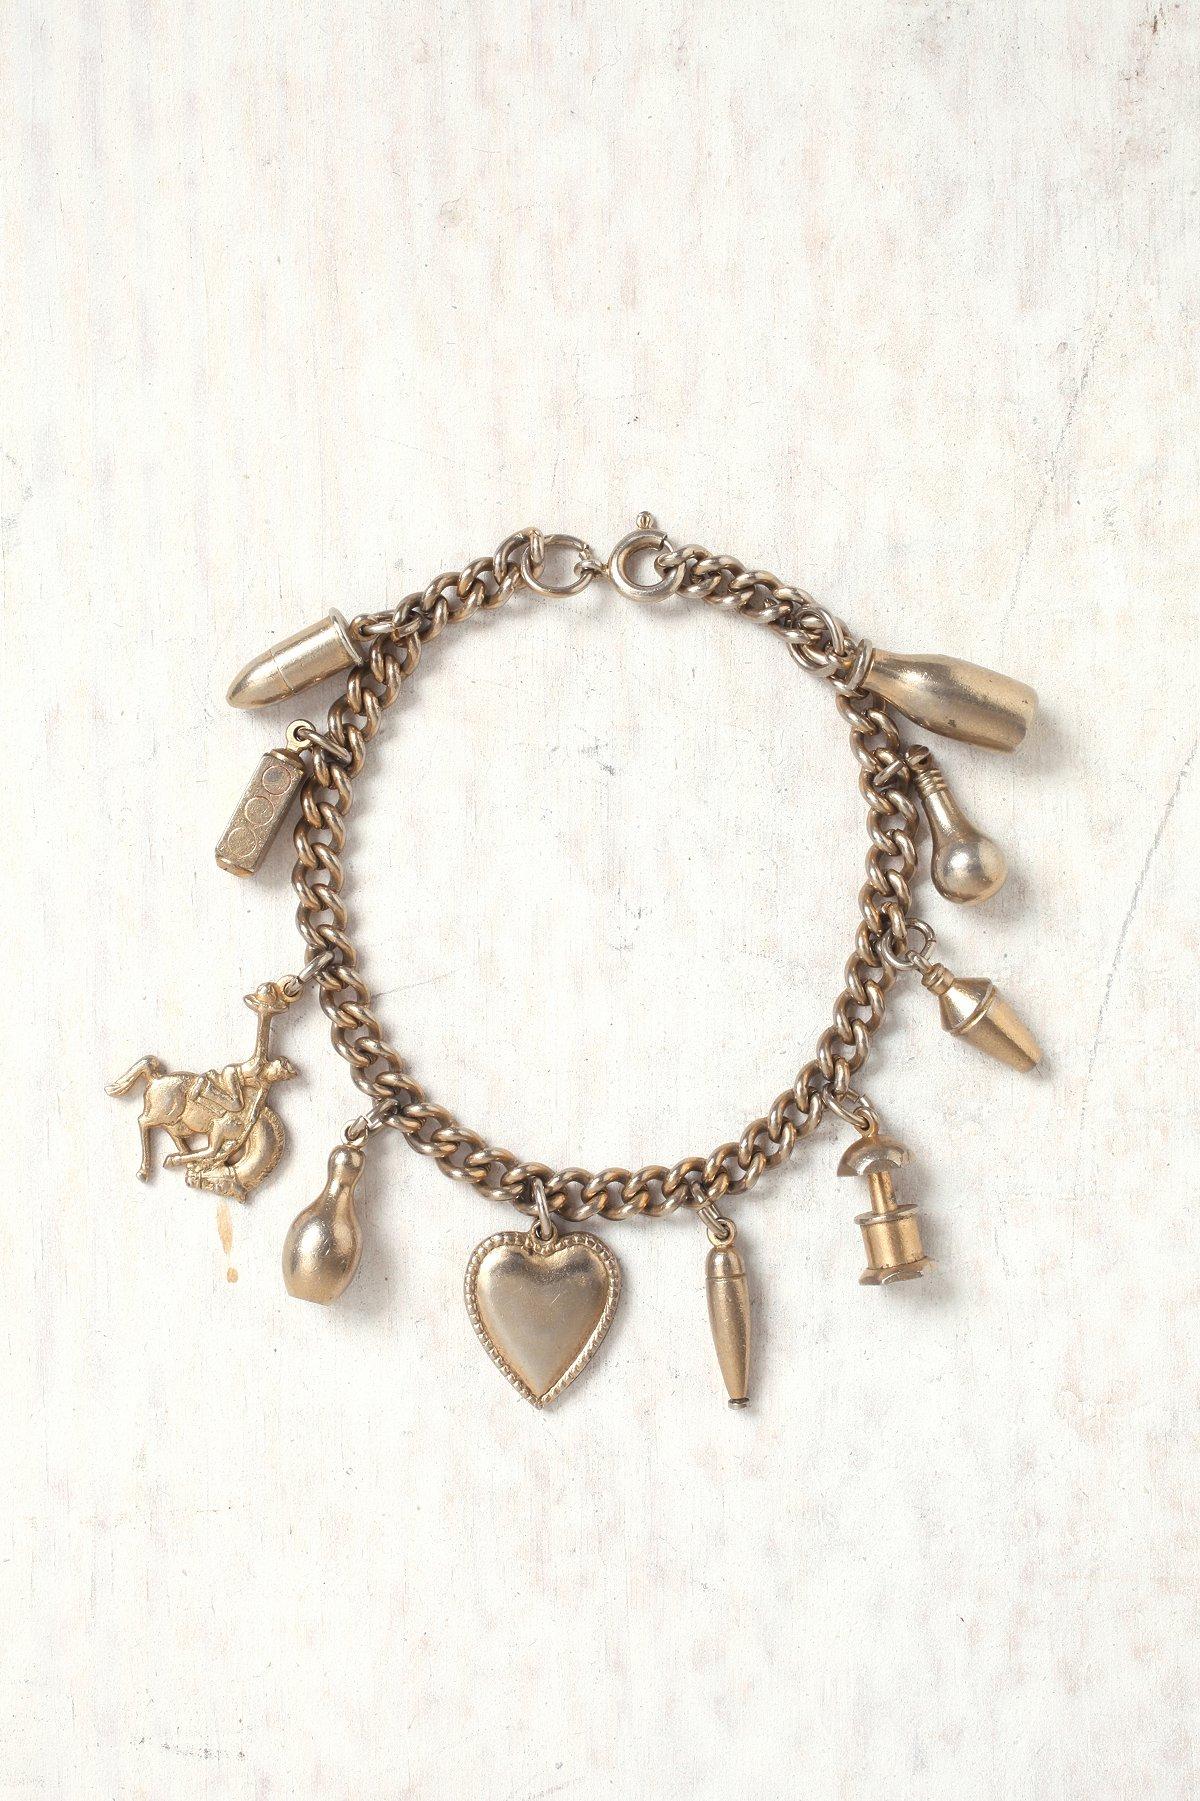 Vintage 1950s Silver Charm Bracelet